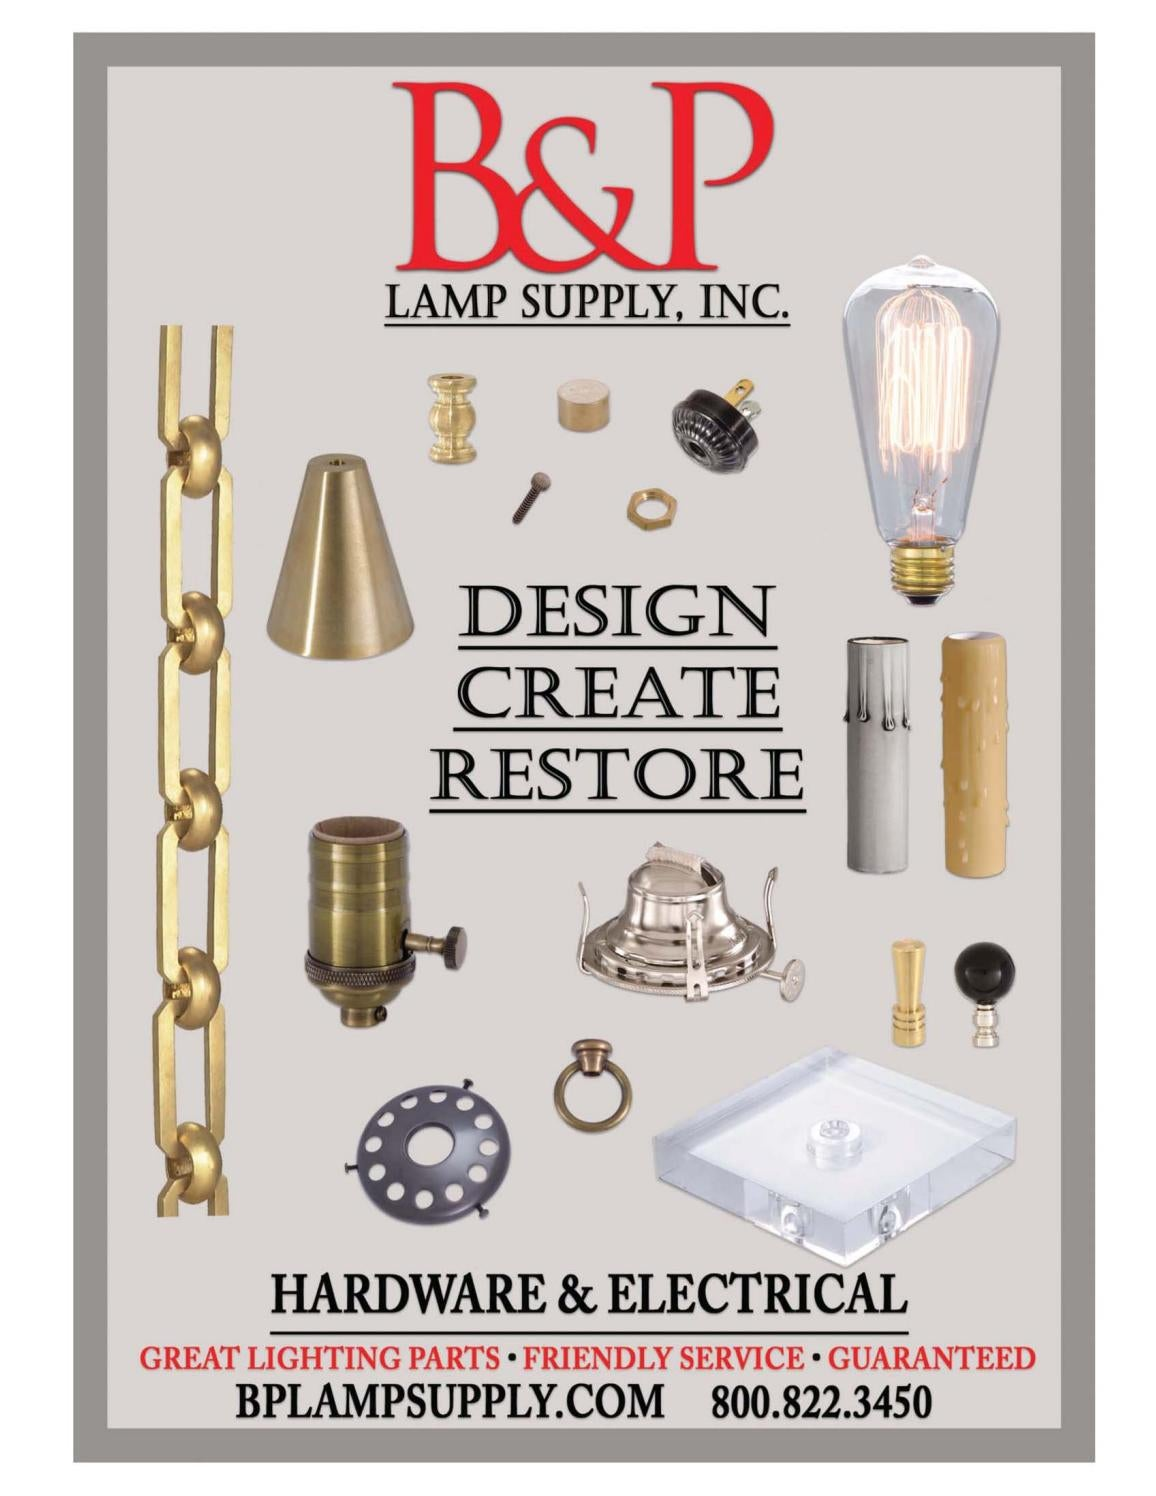 B P Lamp Supply Inc Hardware